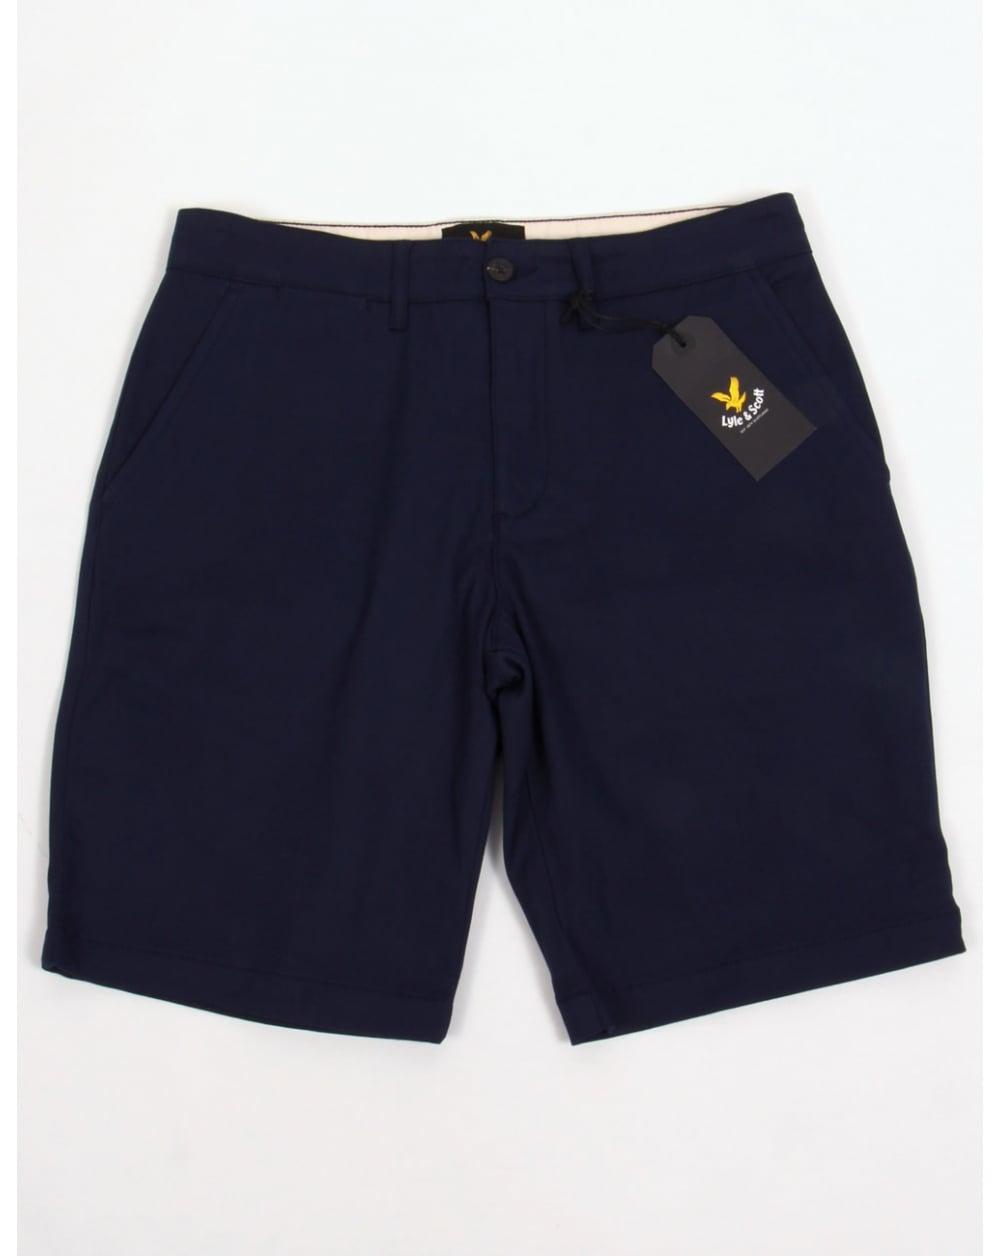 Mens Classic Chino Shorts Lyle & Scott f9idjb3